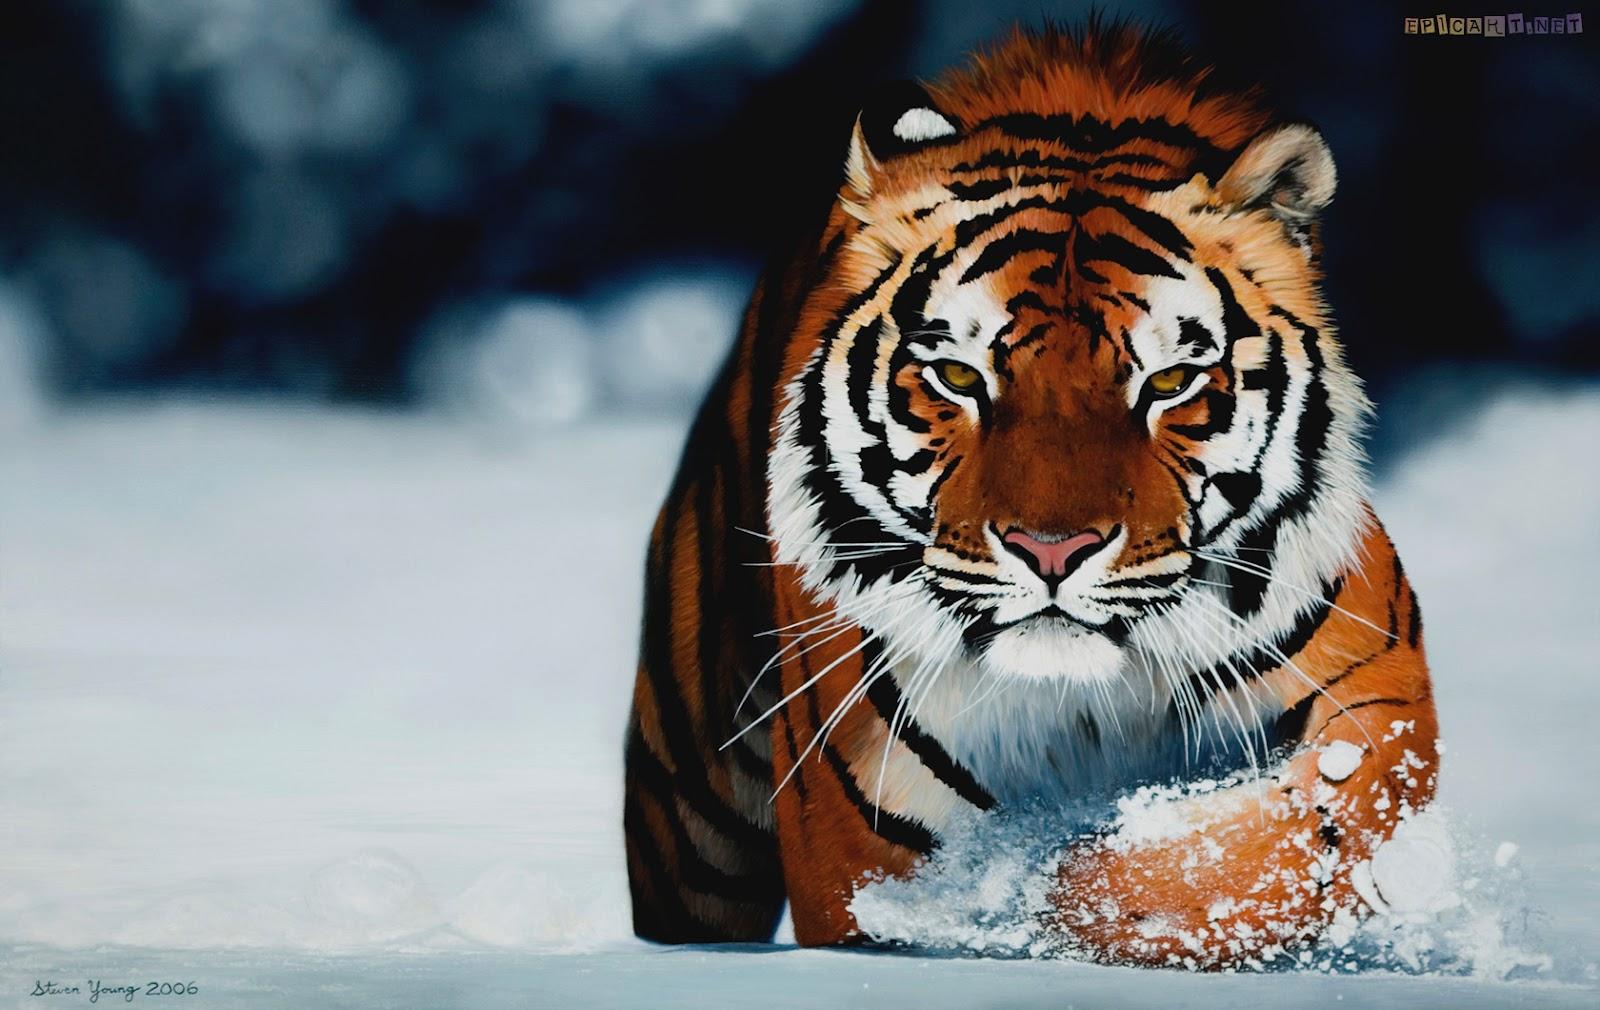 http://4.bp.blogspot.com/-GHEhNwUIgGI/T1hh8OaOECI/AAAAAAAABg0/K6Py1CZLo_w/s1600/siberian-tiger-wallpaper+3.jpg